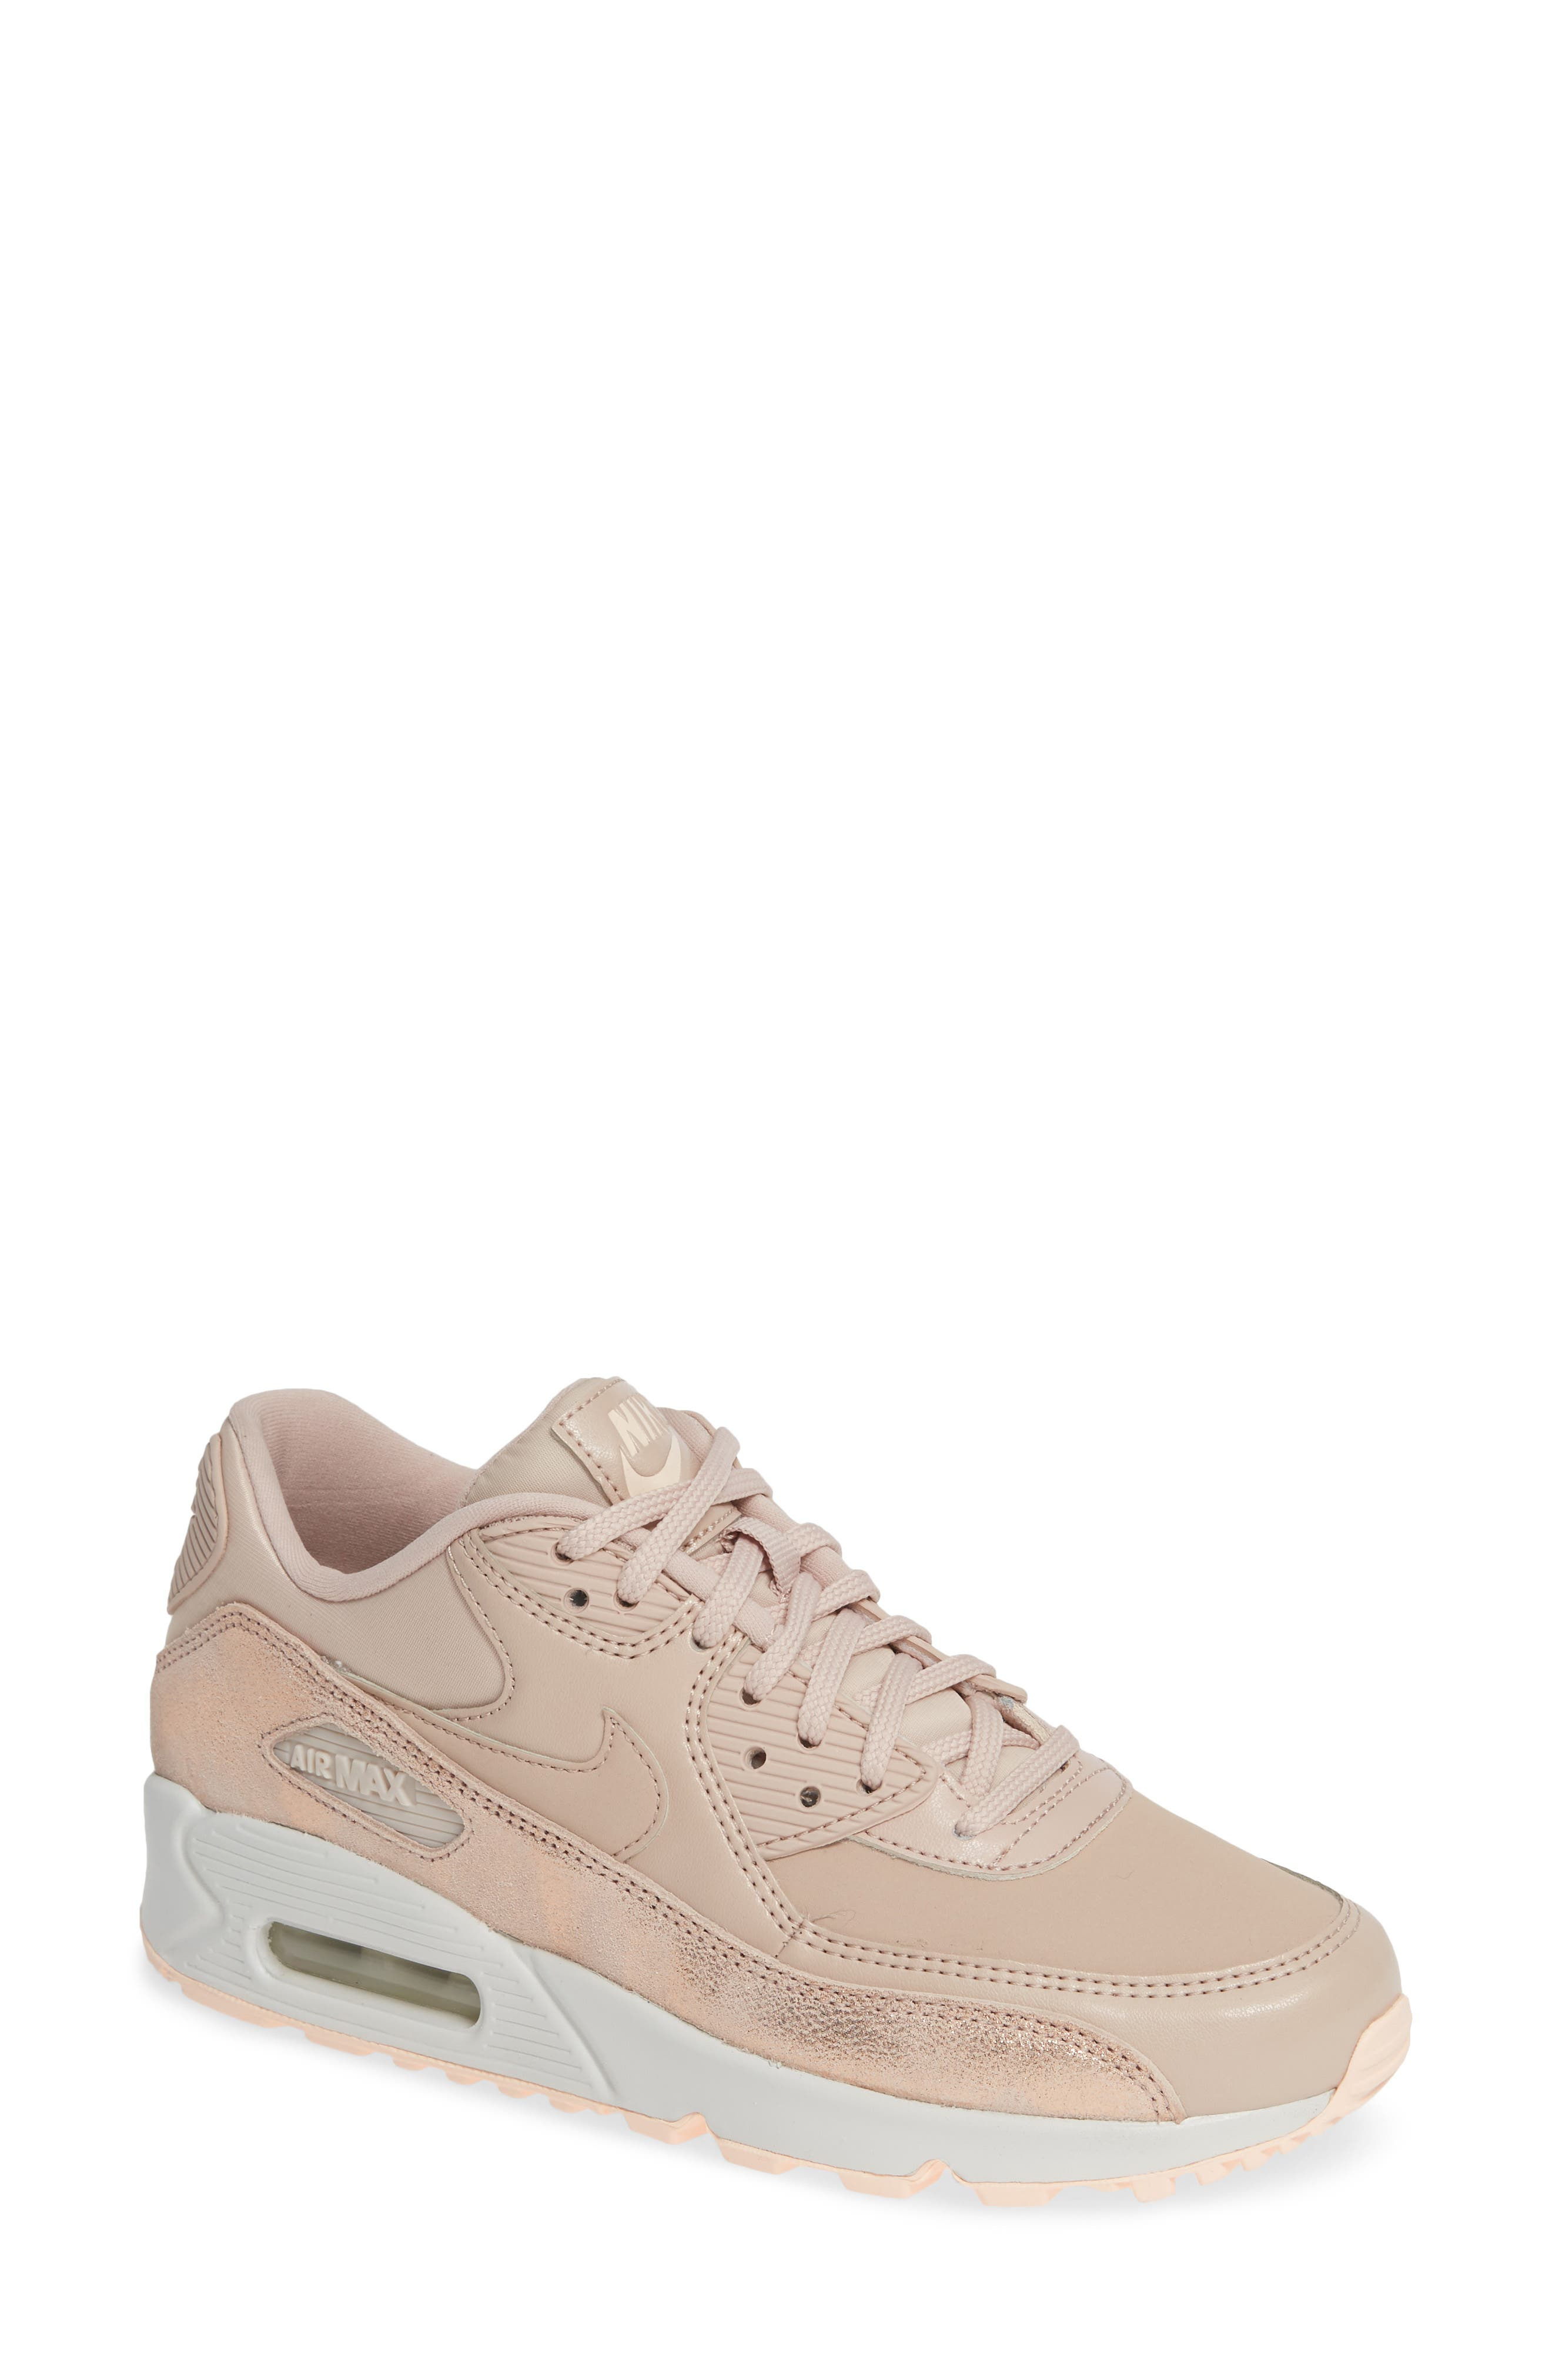 Air Max 90 SE Sneaker,                             Main thumbnail 2, color,